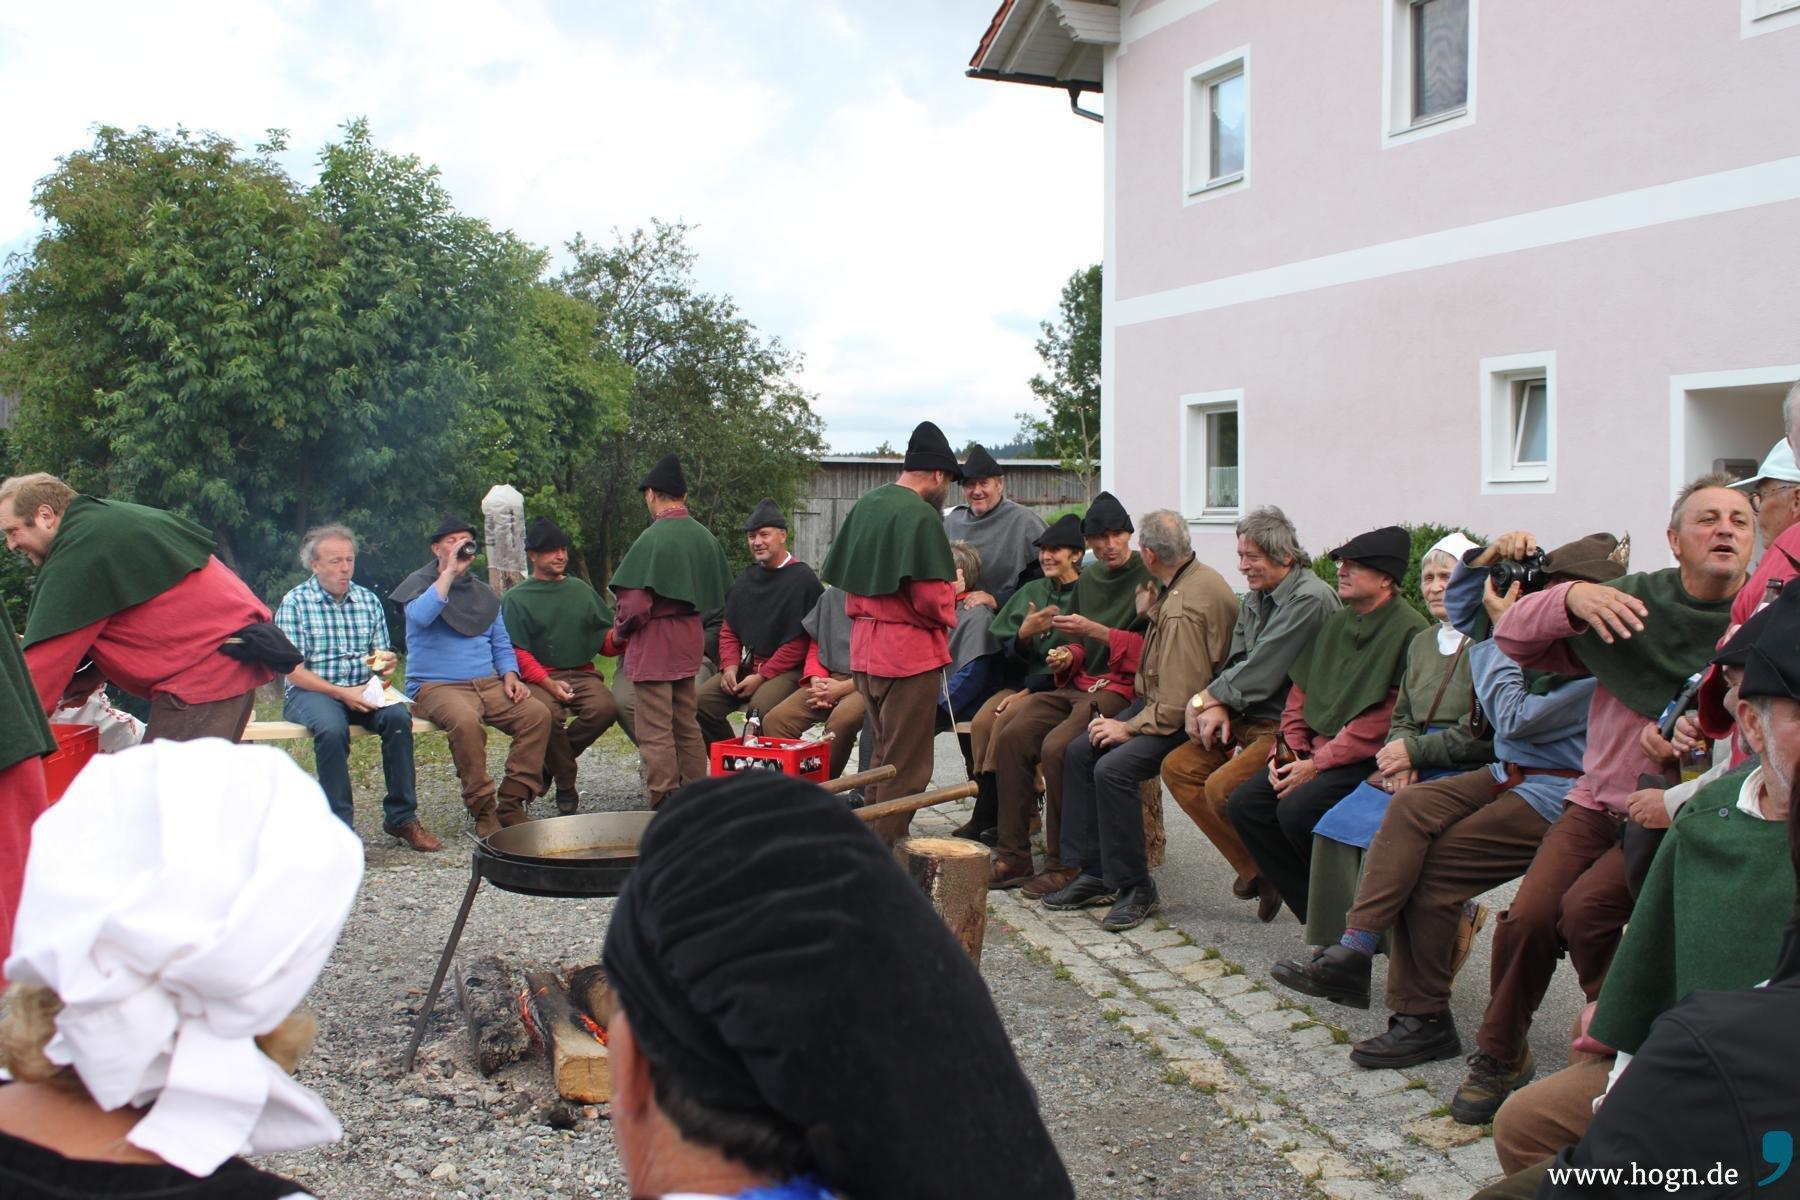 saeumferfest-2012-21